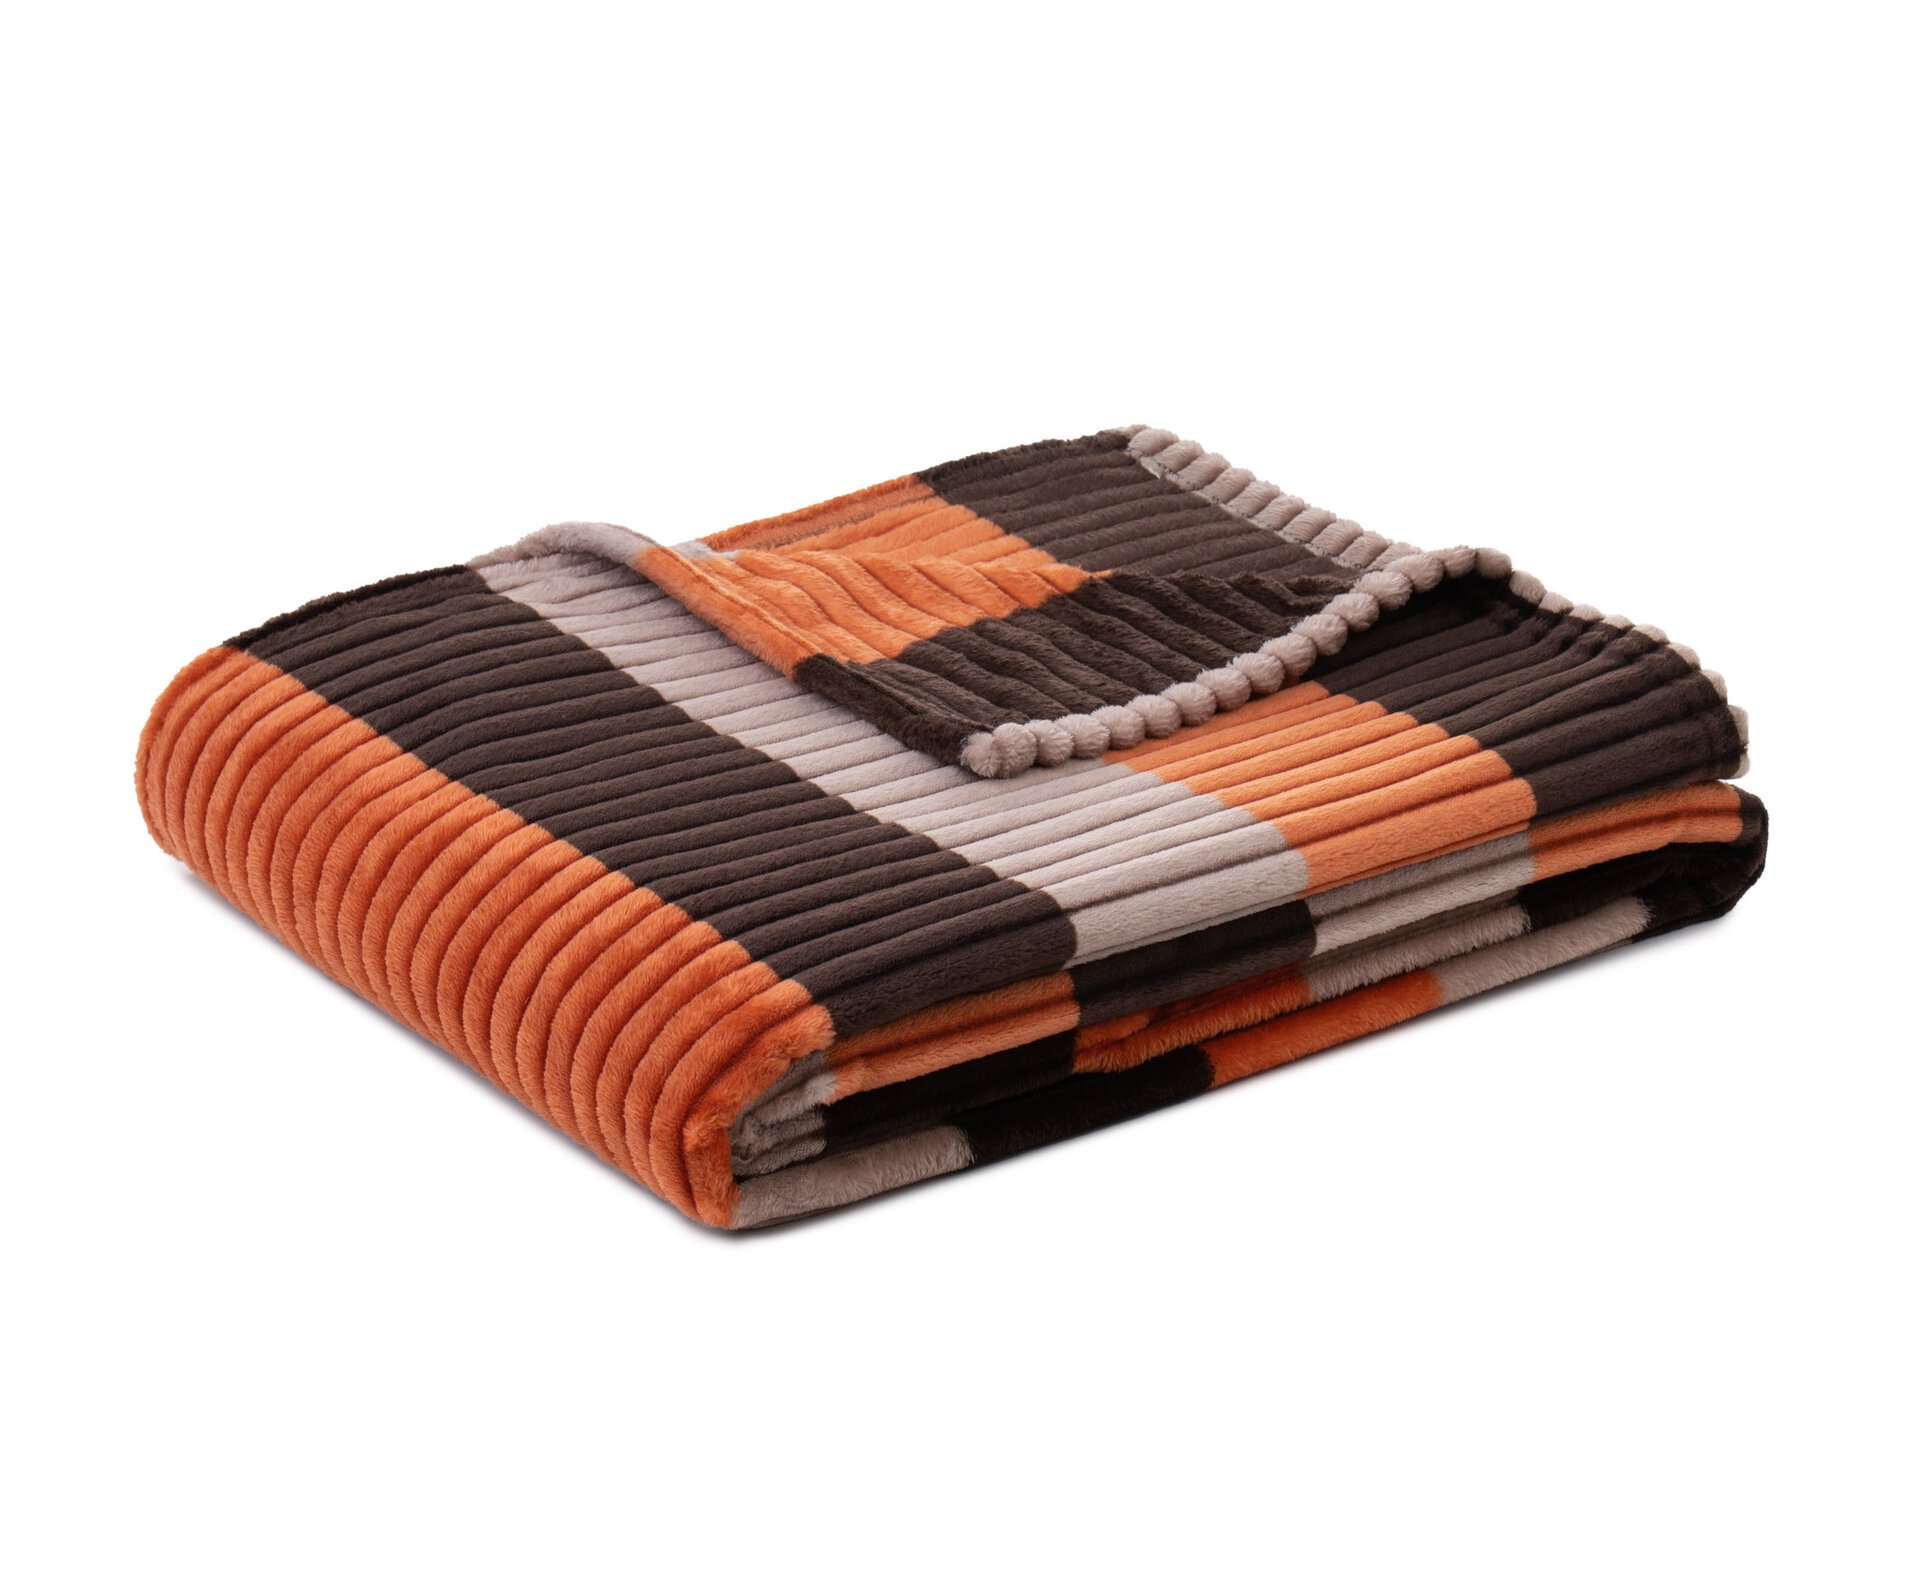 Wohndecke Cord Optik Ambiente Trendlife Textil orange 150 x 200 cm